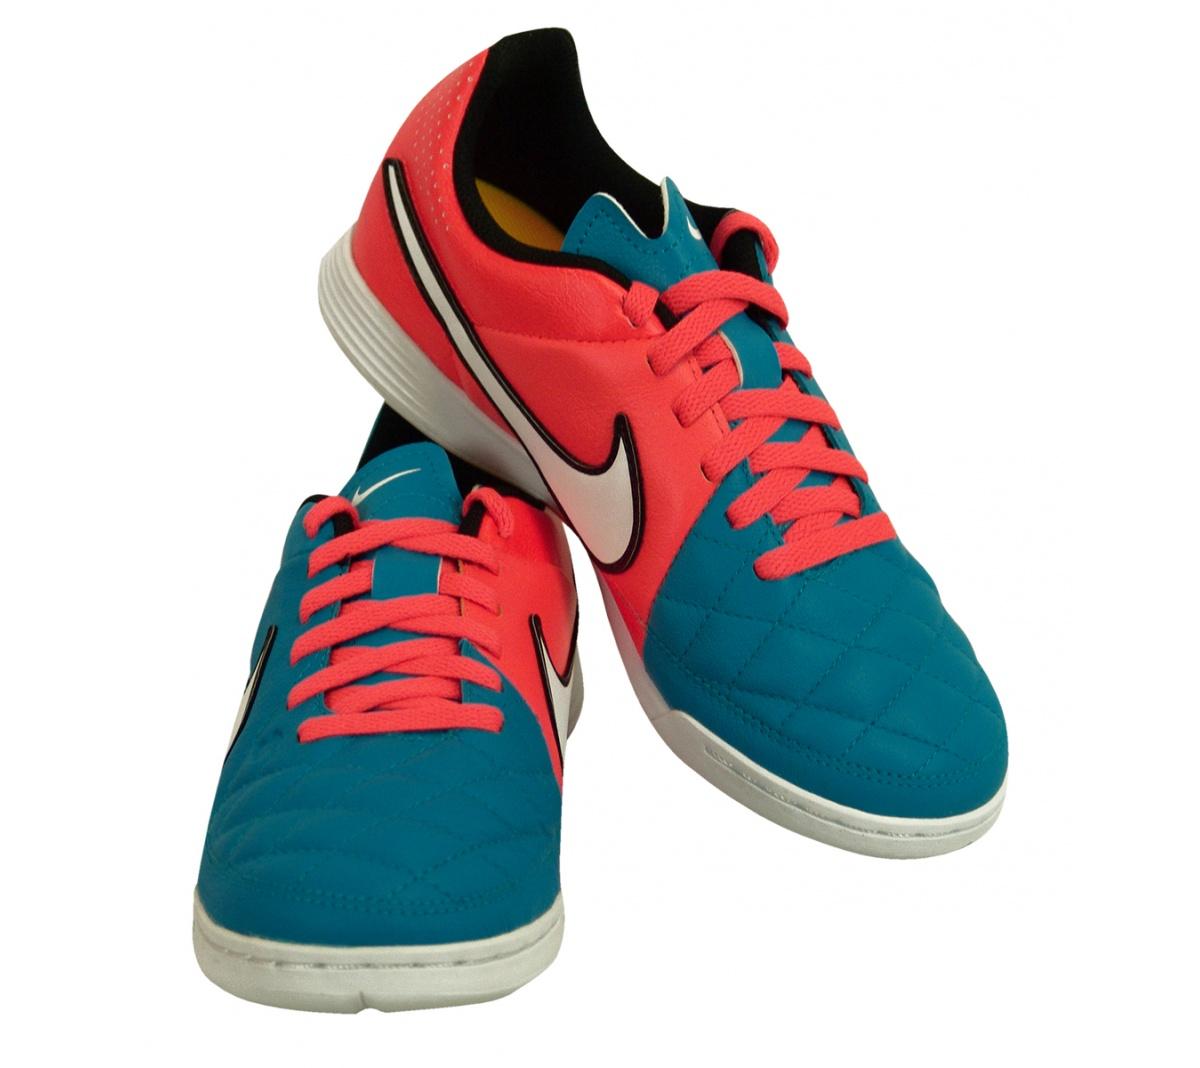 Tênis Nike Tiempo Genio Leather Futsal Infantil - Mundo do Futebol 1853d143df05f